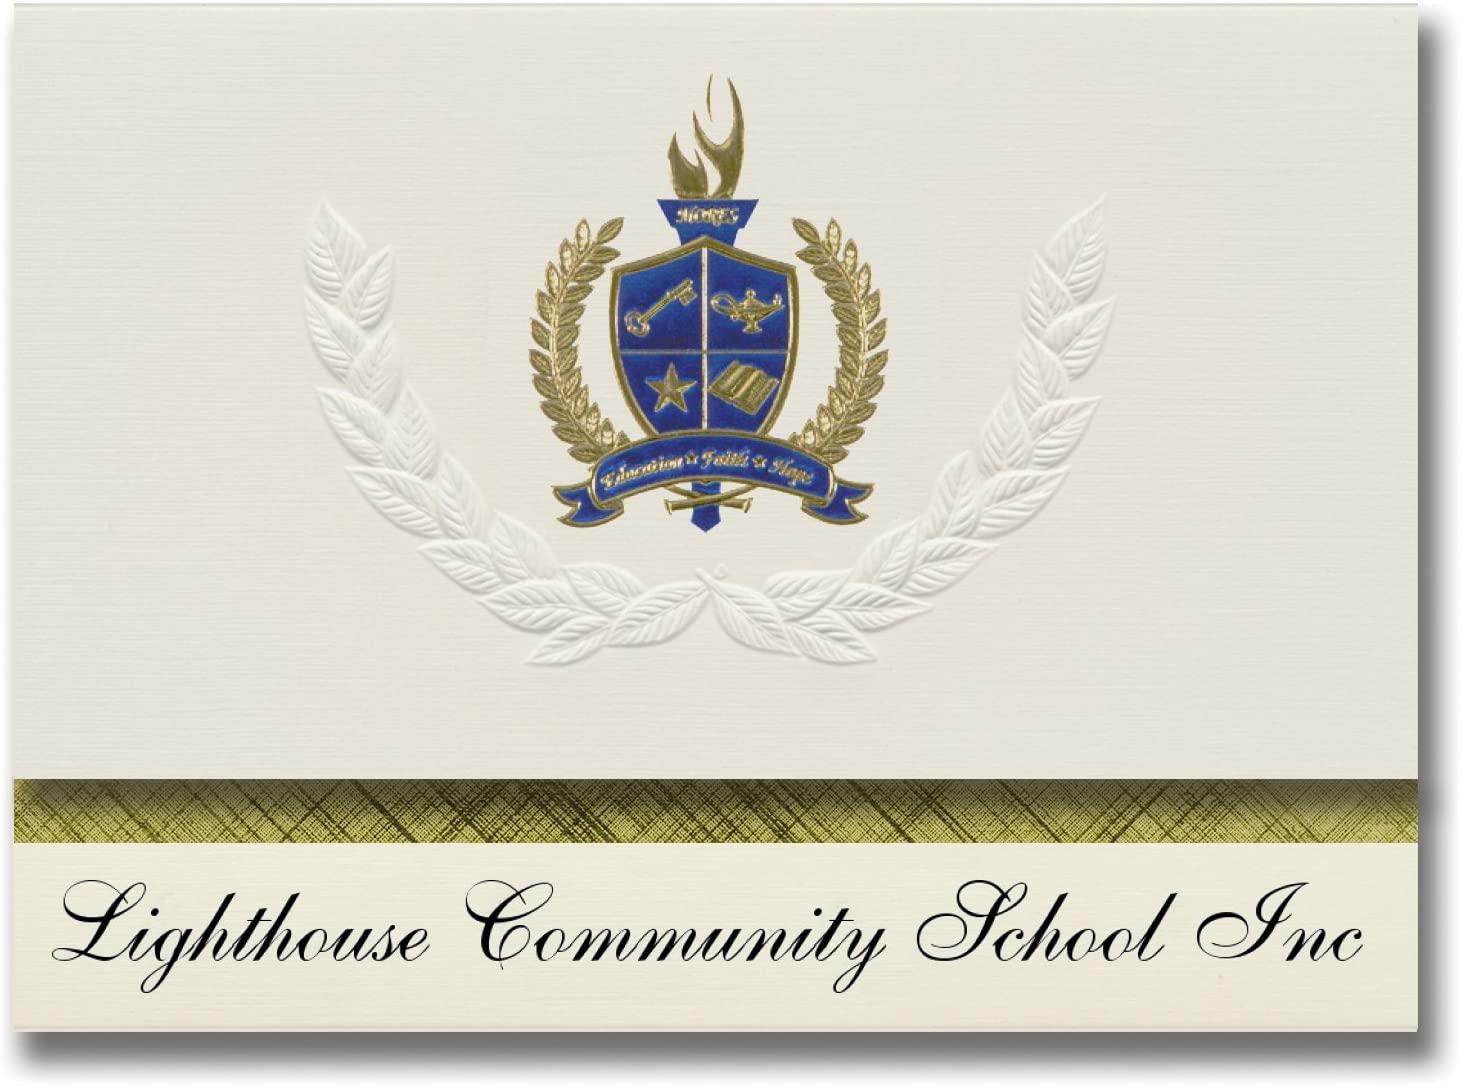 Signature Announcements Lighthouse Community School Inc (Cincinnati, OH) Graduation Announcements, Presidential Elite Pack 25 with Gold & Blue Metallic Foil seal